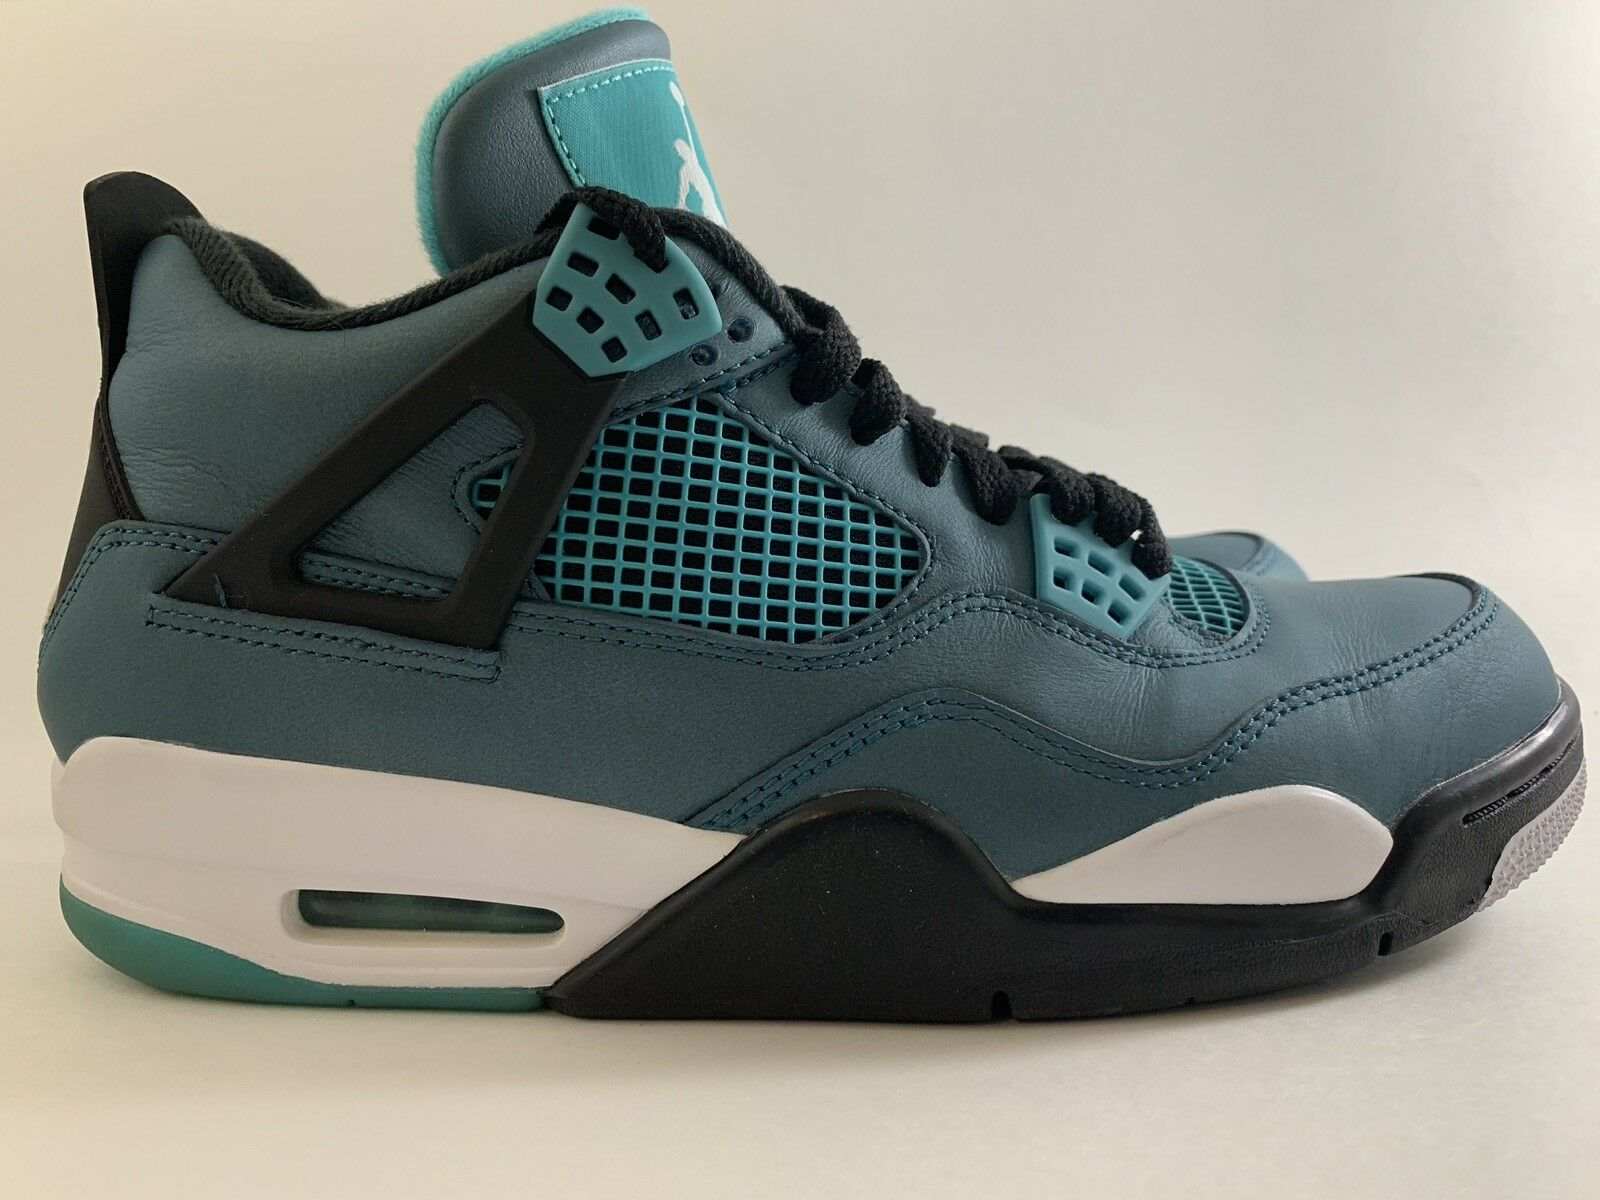 "Nike Jordan 4 Retro 30TH Anniversary  Teal"" 100% Authentic  US 9.5 (705331330)"